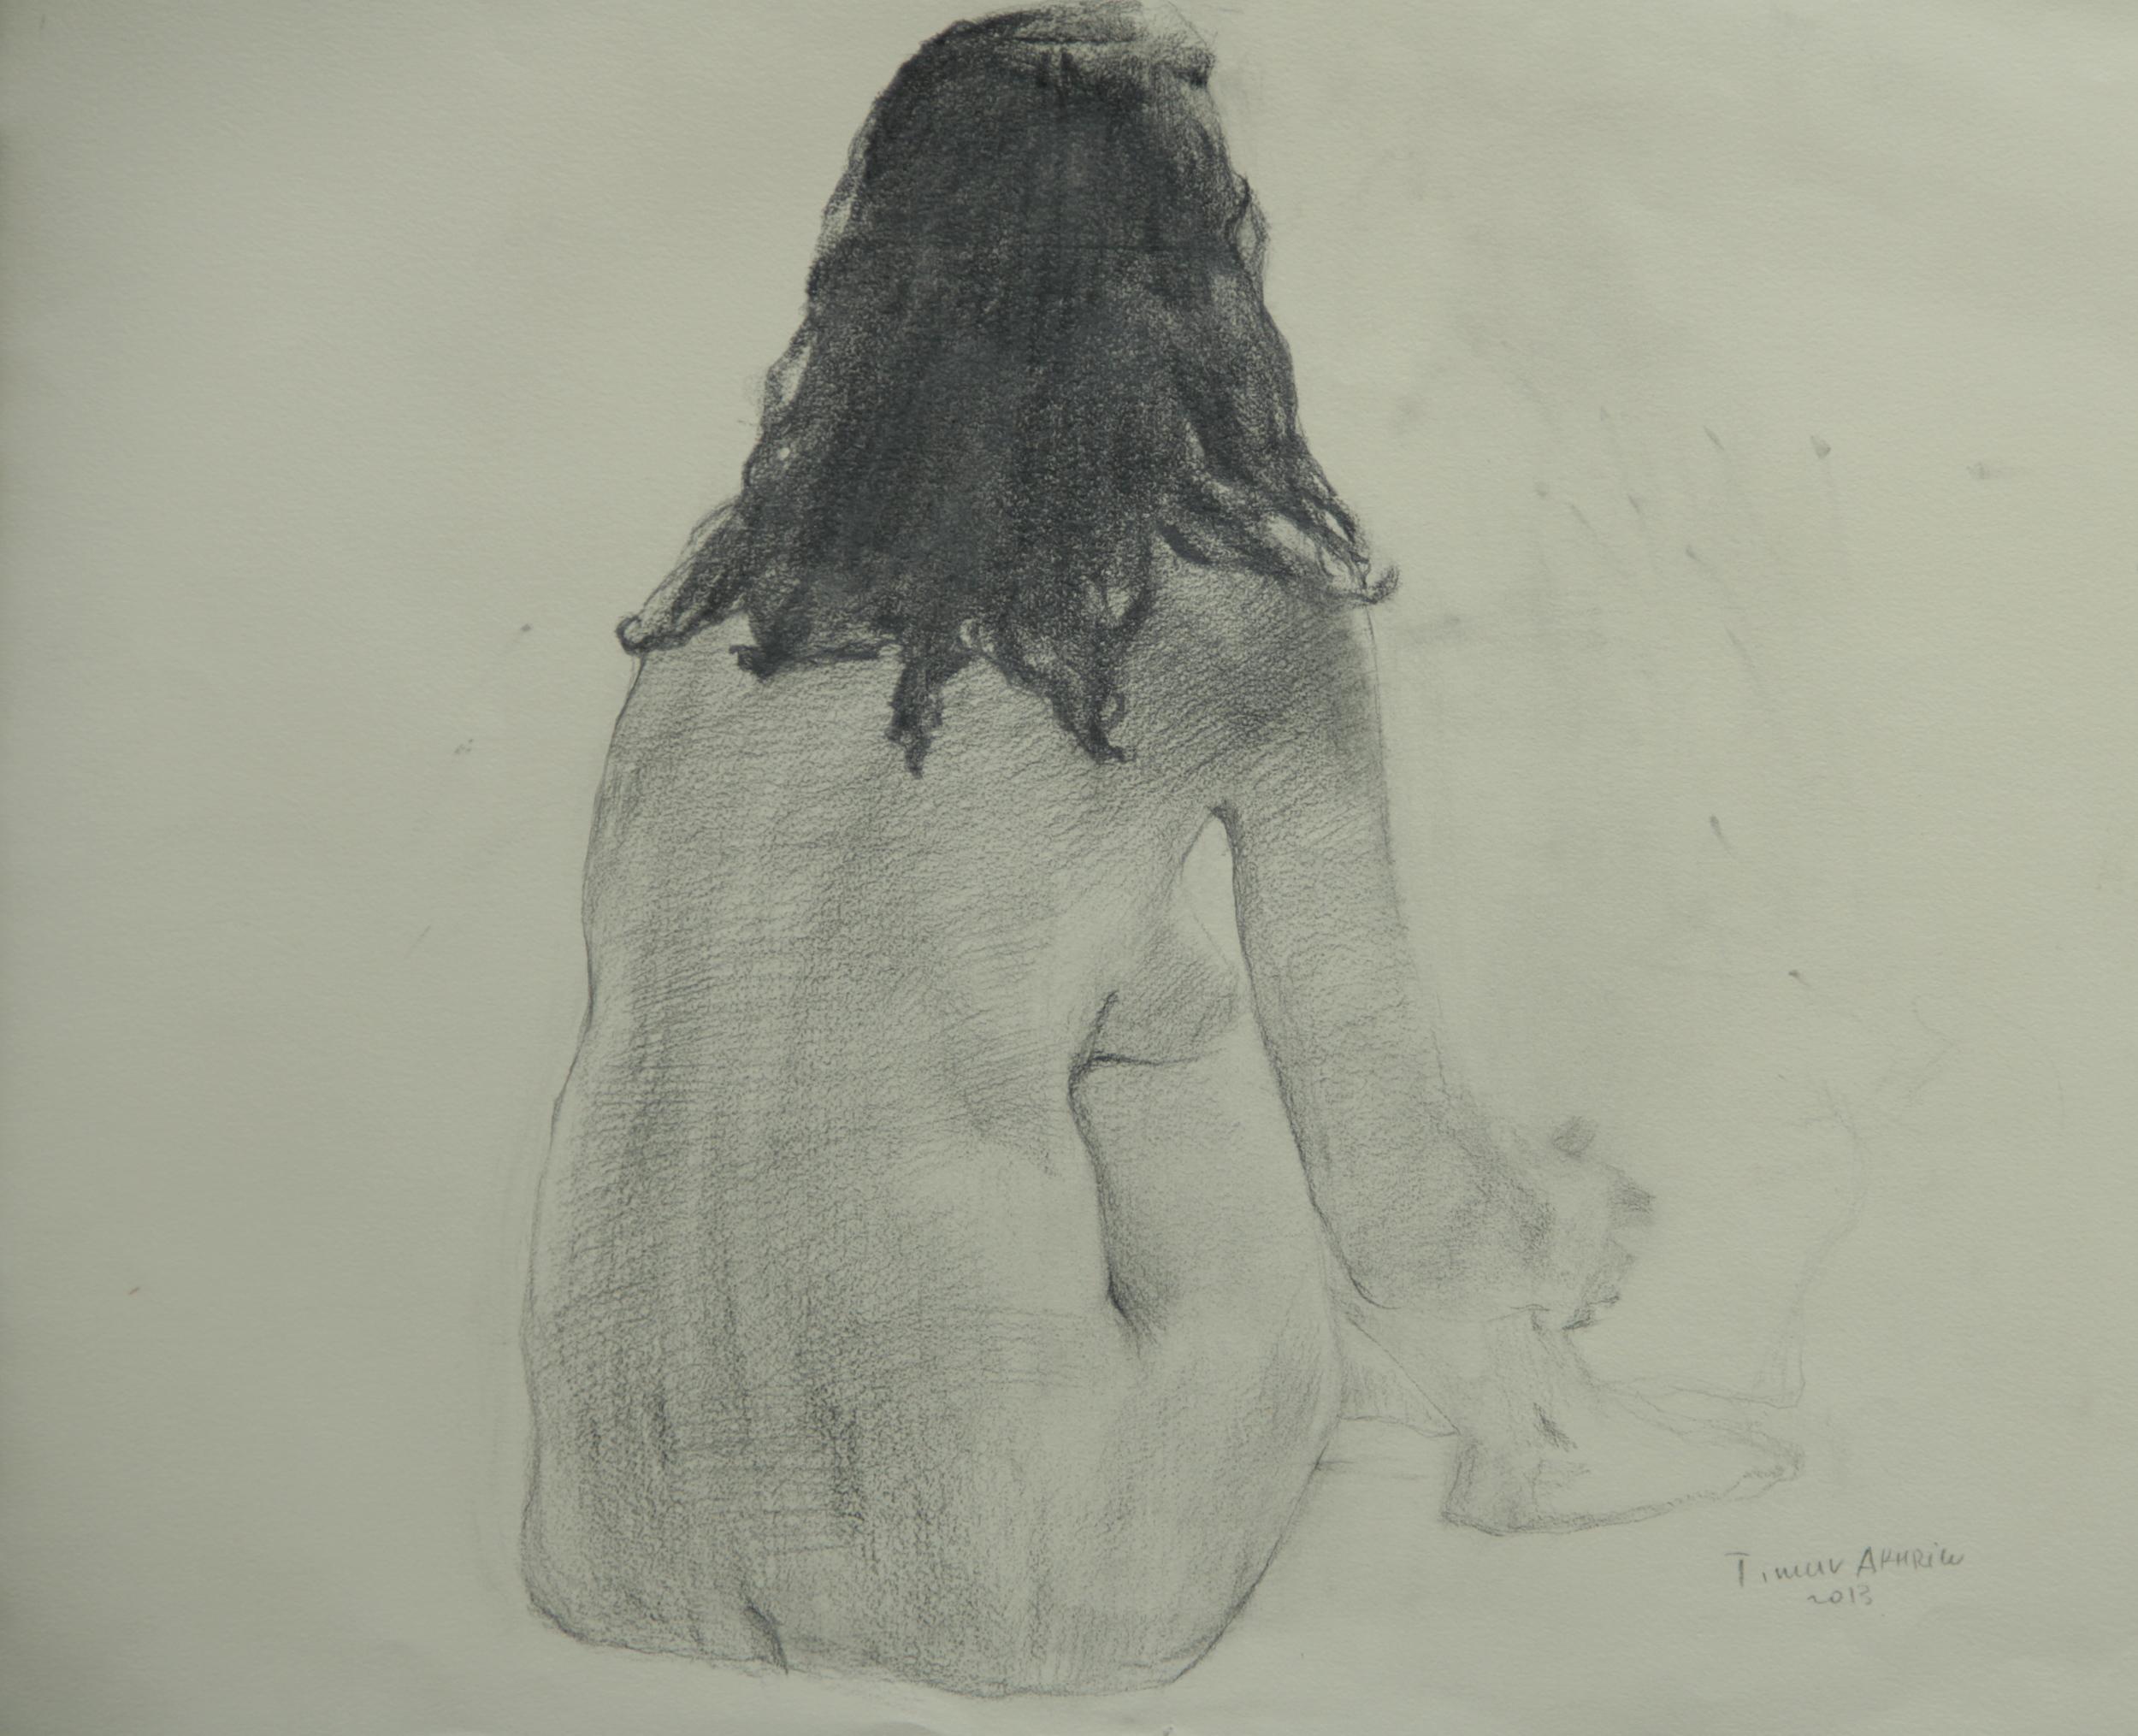 "Timur Akhriev Title: Nude, Back Pose 19,75' x 22"", Graphite on Paper, 2013.  $1000"